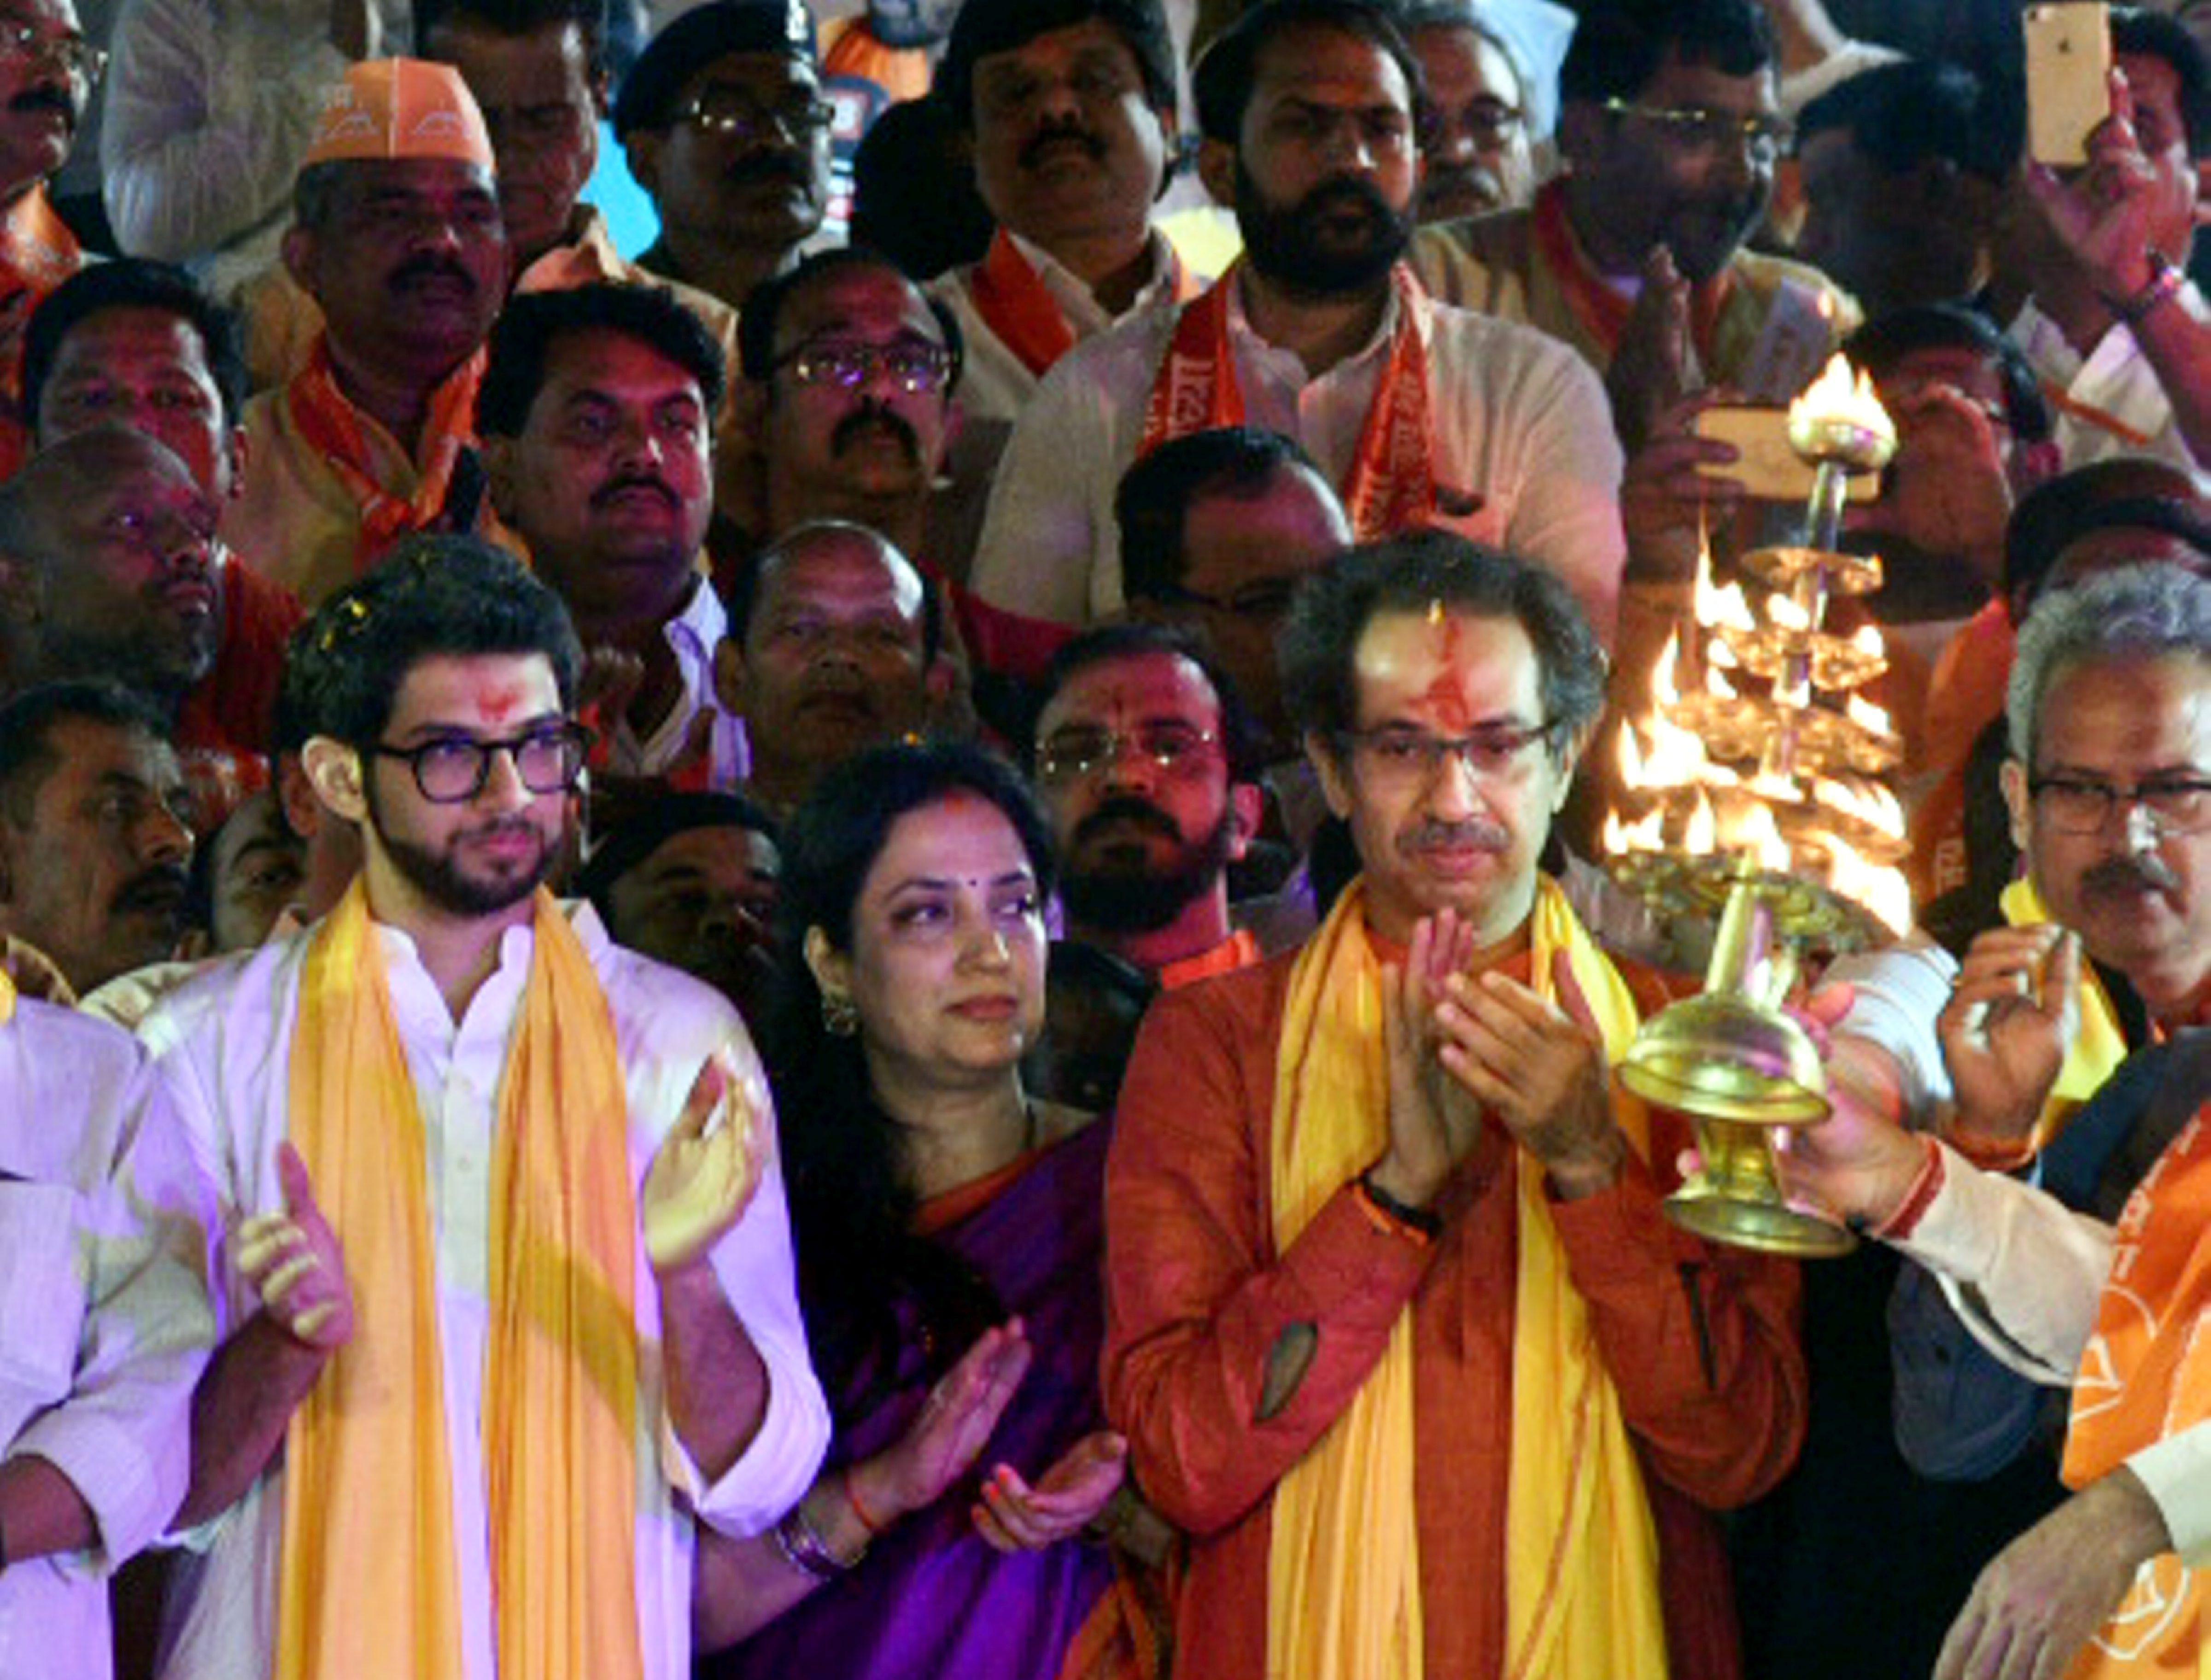 Shiv Sena chief Uddhav Thackeray, Yuva Sena chief Aditya Thackeray and Rashmi Thackeray offer prayers during Saryu aarti at a ghat in Ayodhya on Saturday